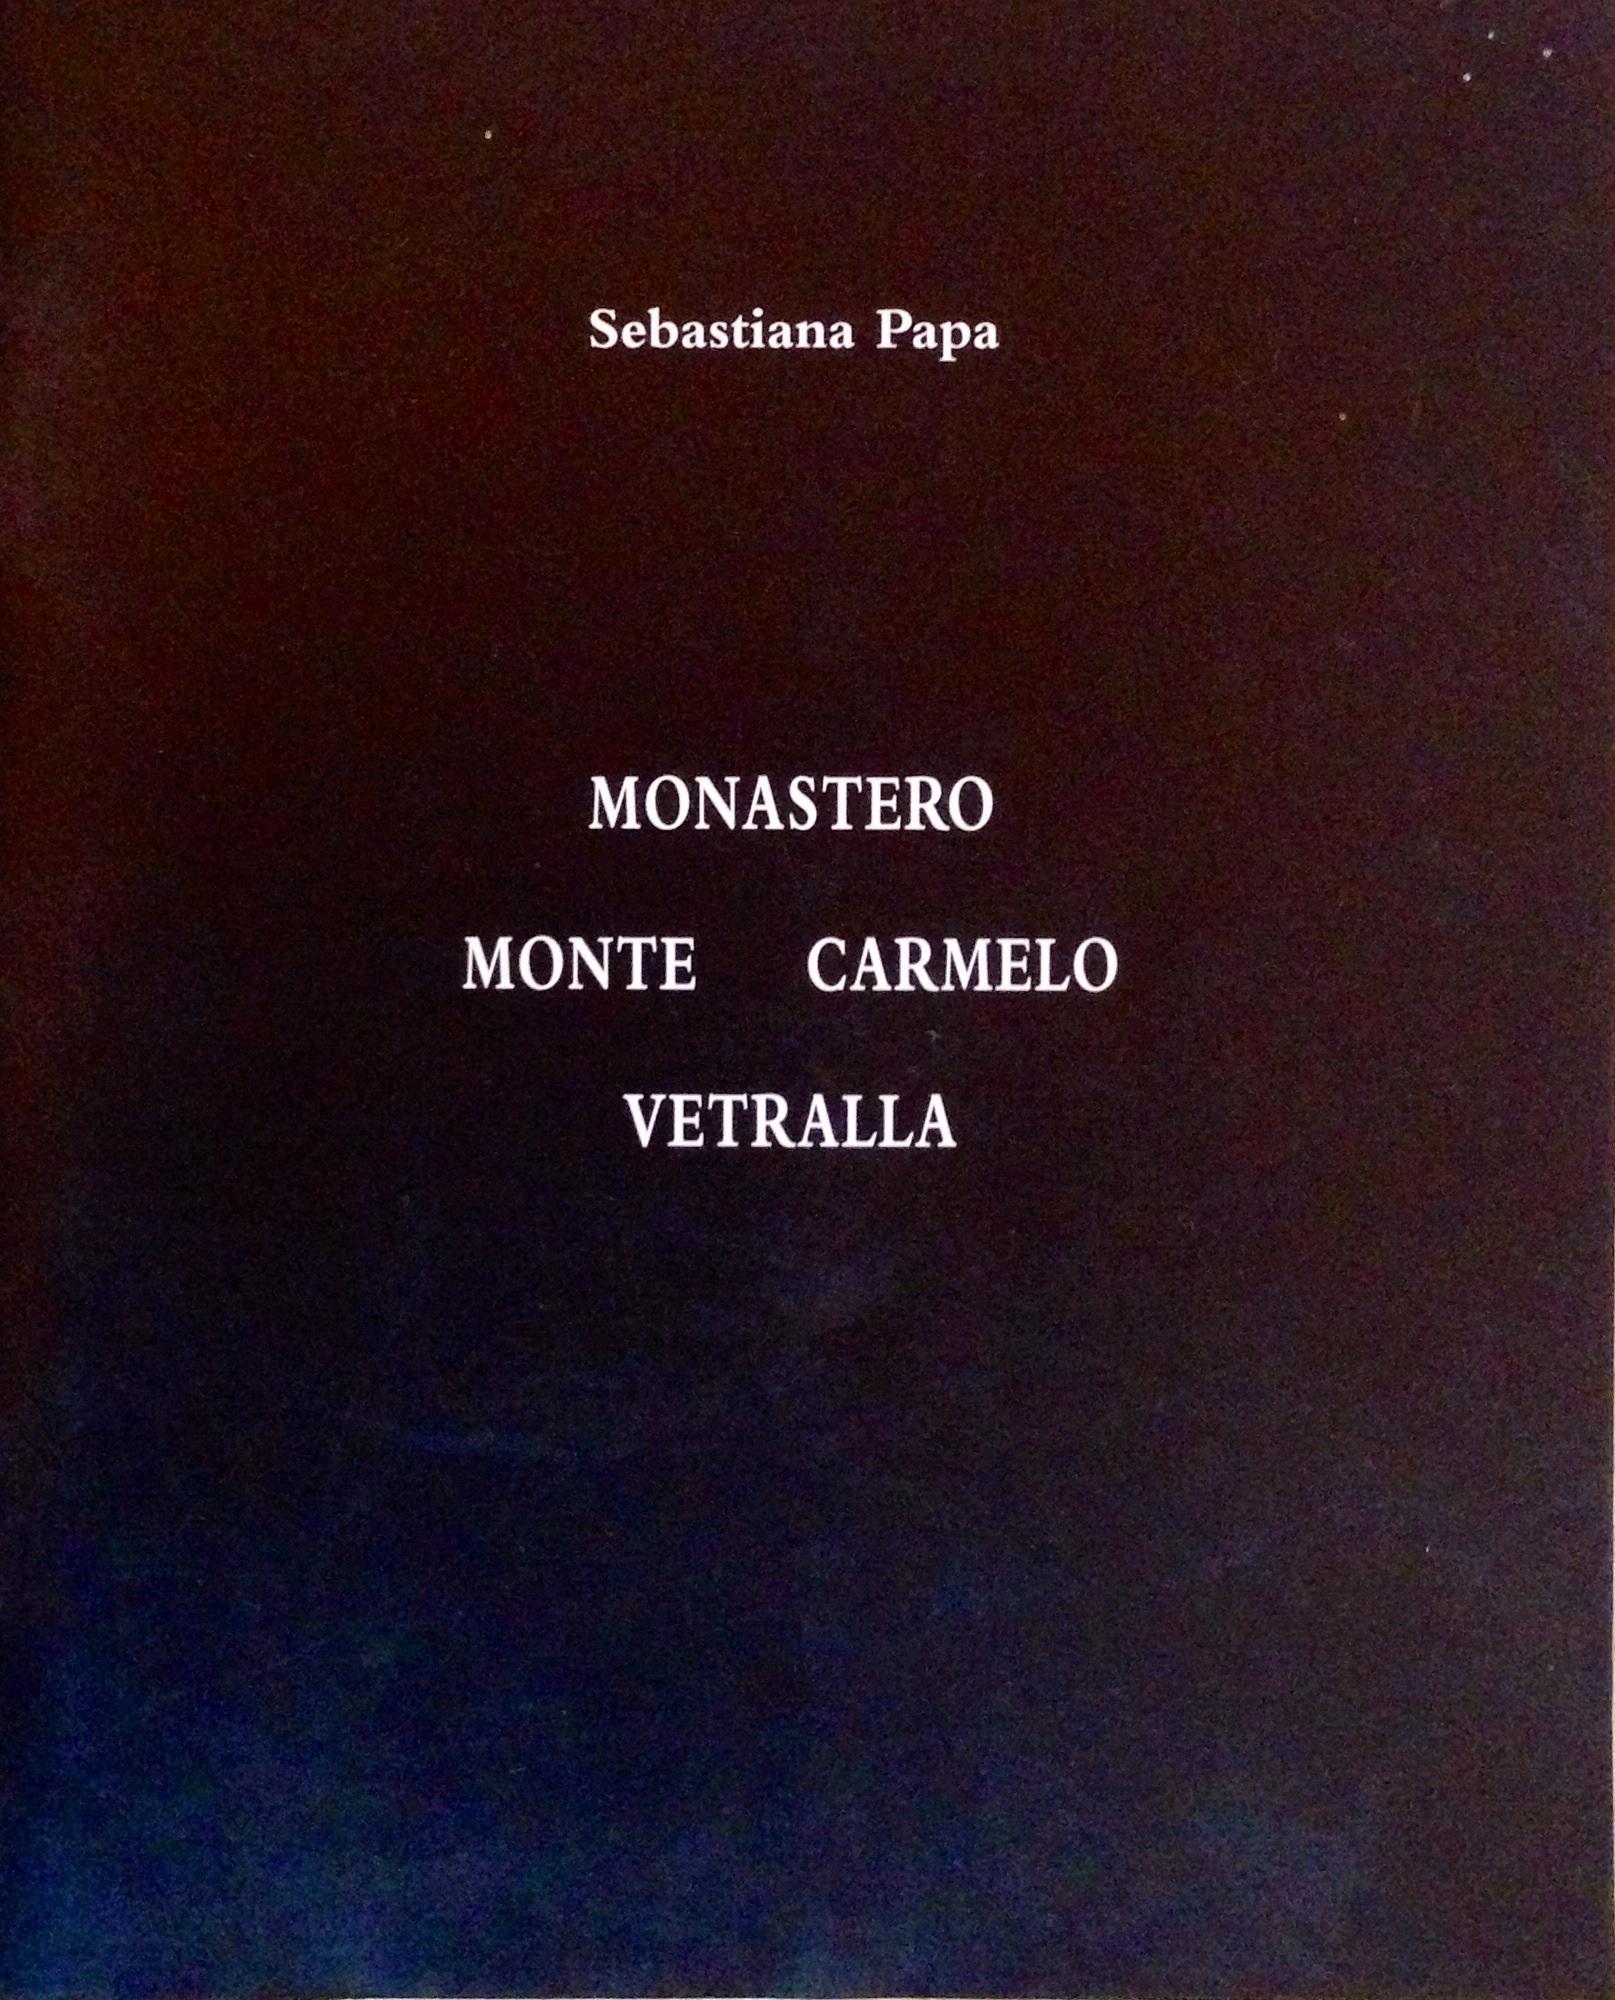 Monastero Monte Carmelo, Vetralla